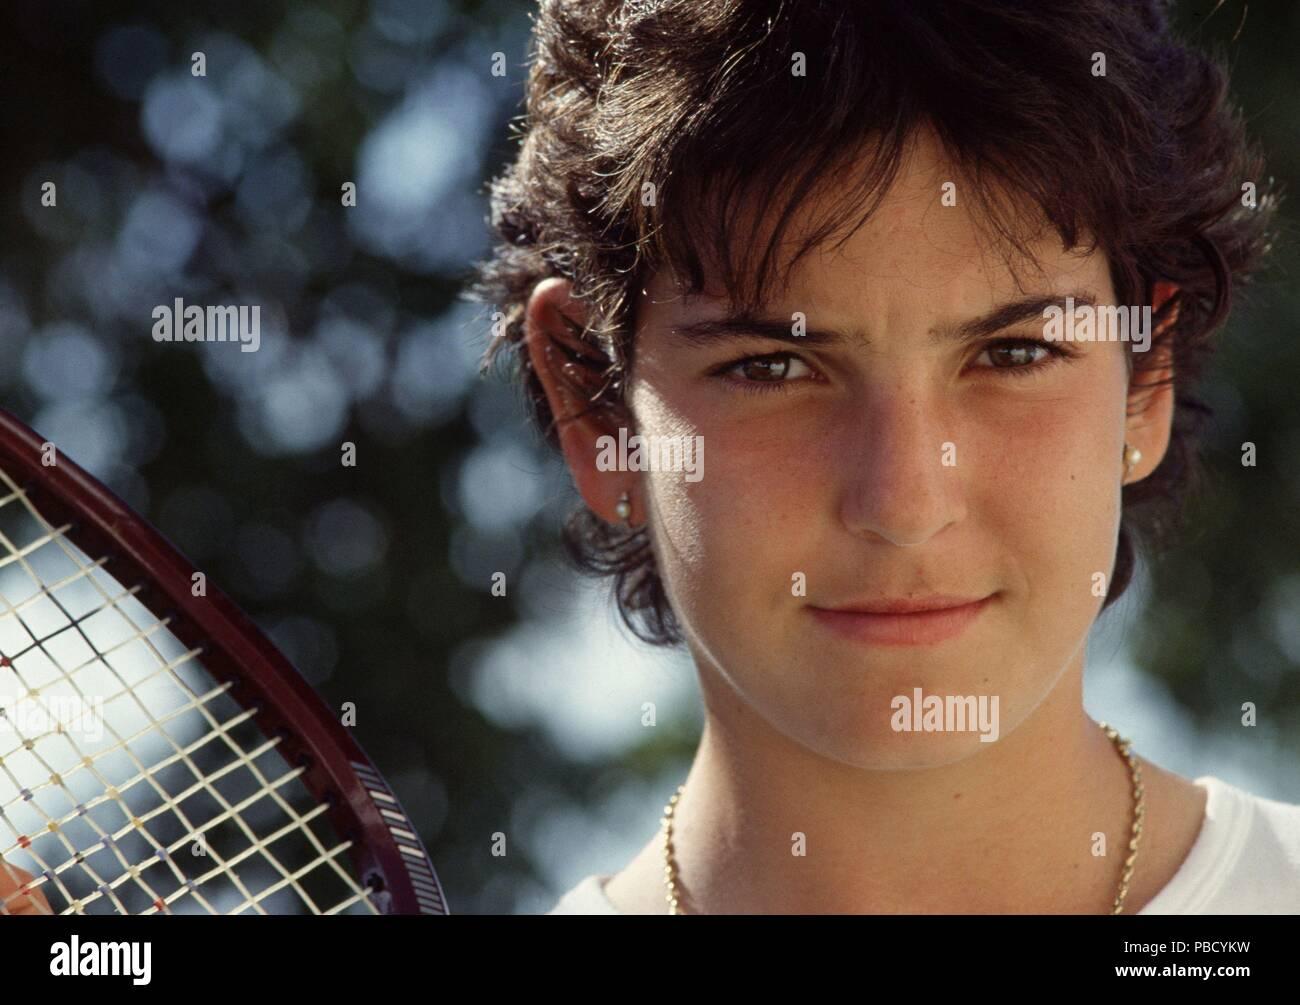 Umpolen – den Minuspol mit dem Pluspol vertauschen - Seite 8 Arancha-sanchez-vicario-tenista-espanola-barcelona-1971-foto-ano-1988-pbcykw